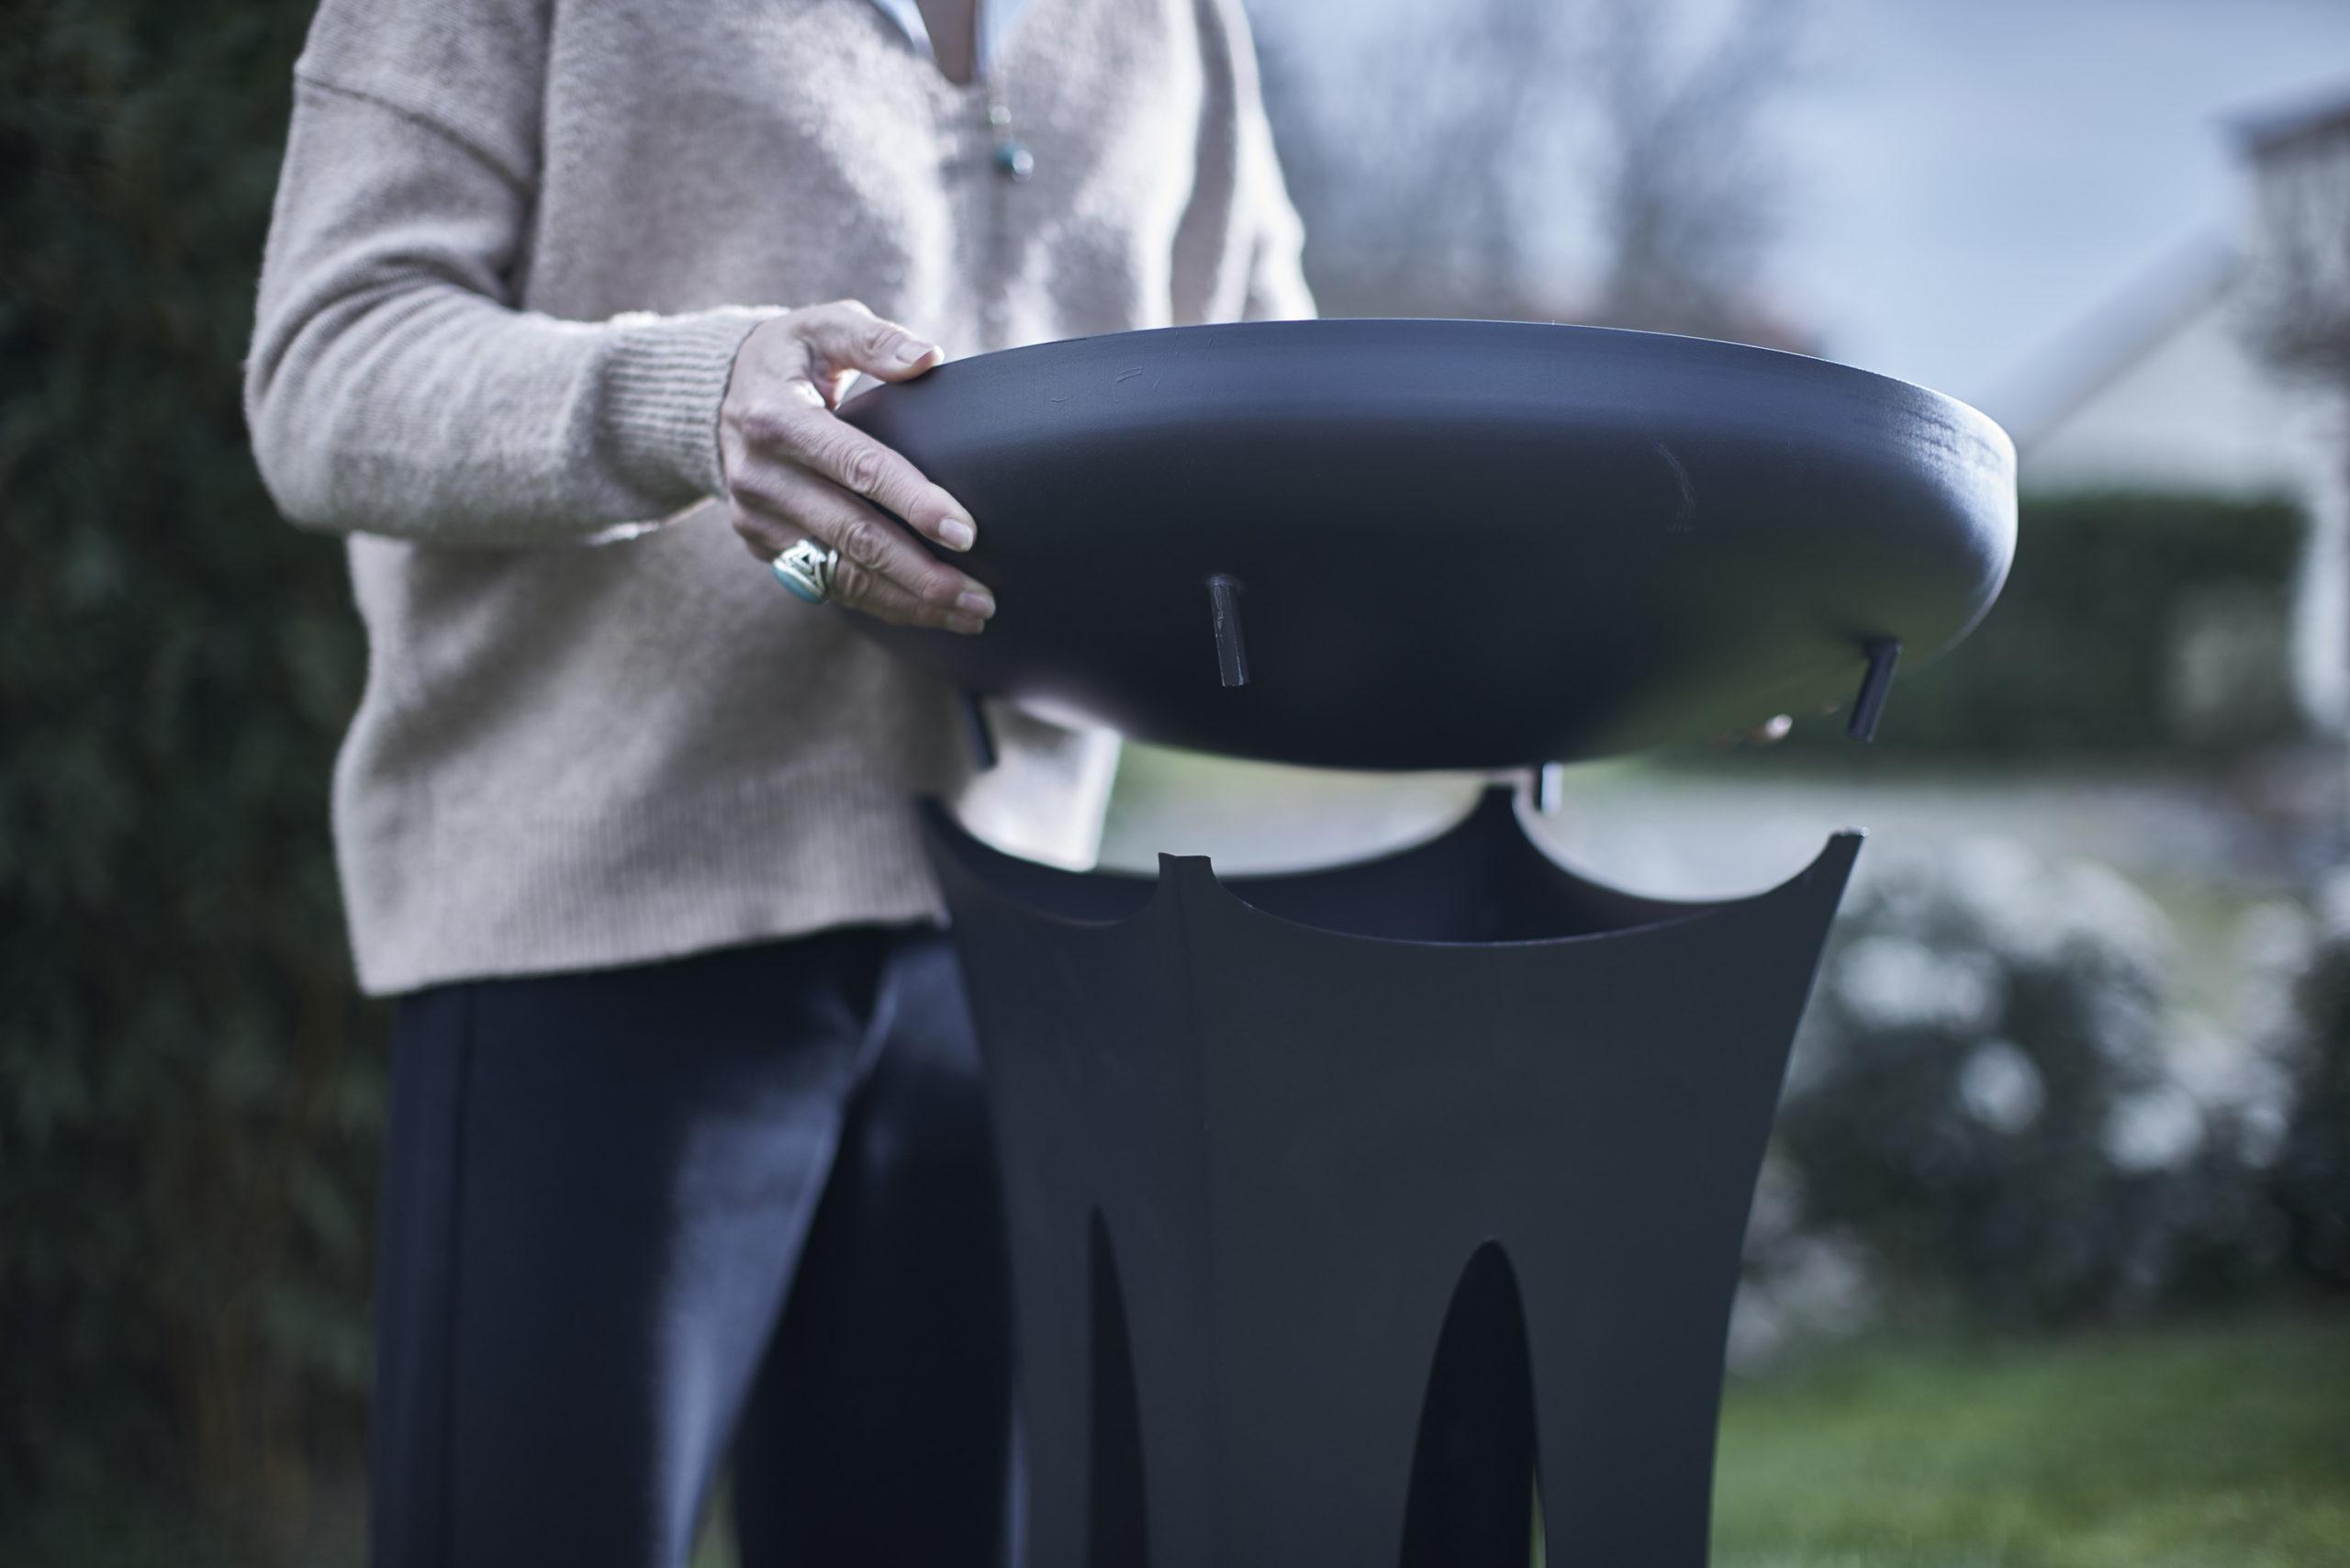 fabrique-france--sakura-brasero-exterieur-design-jardin-table